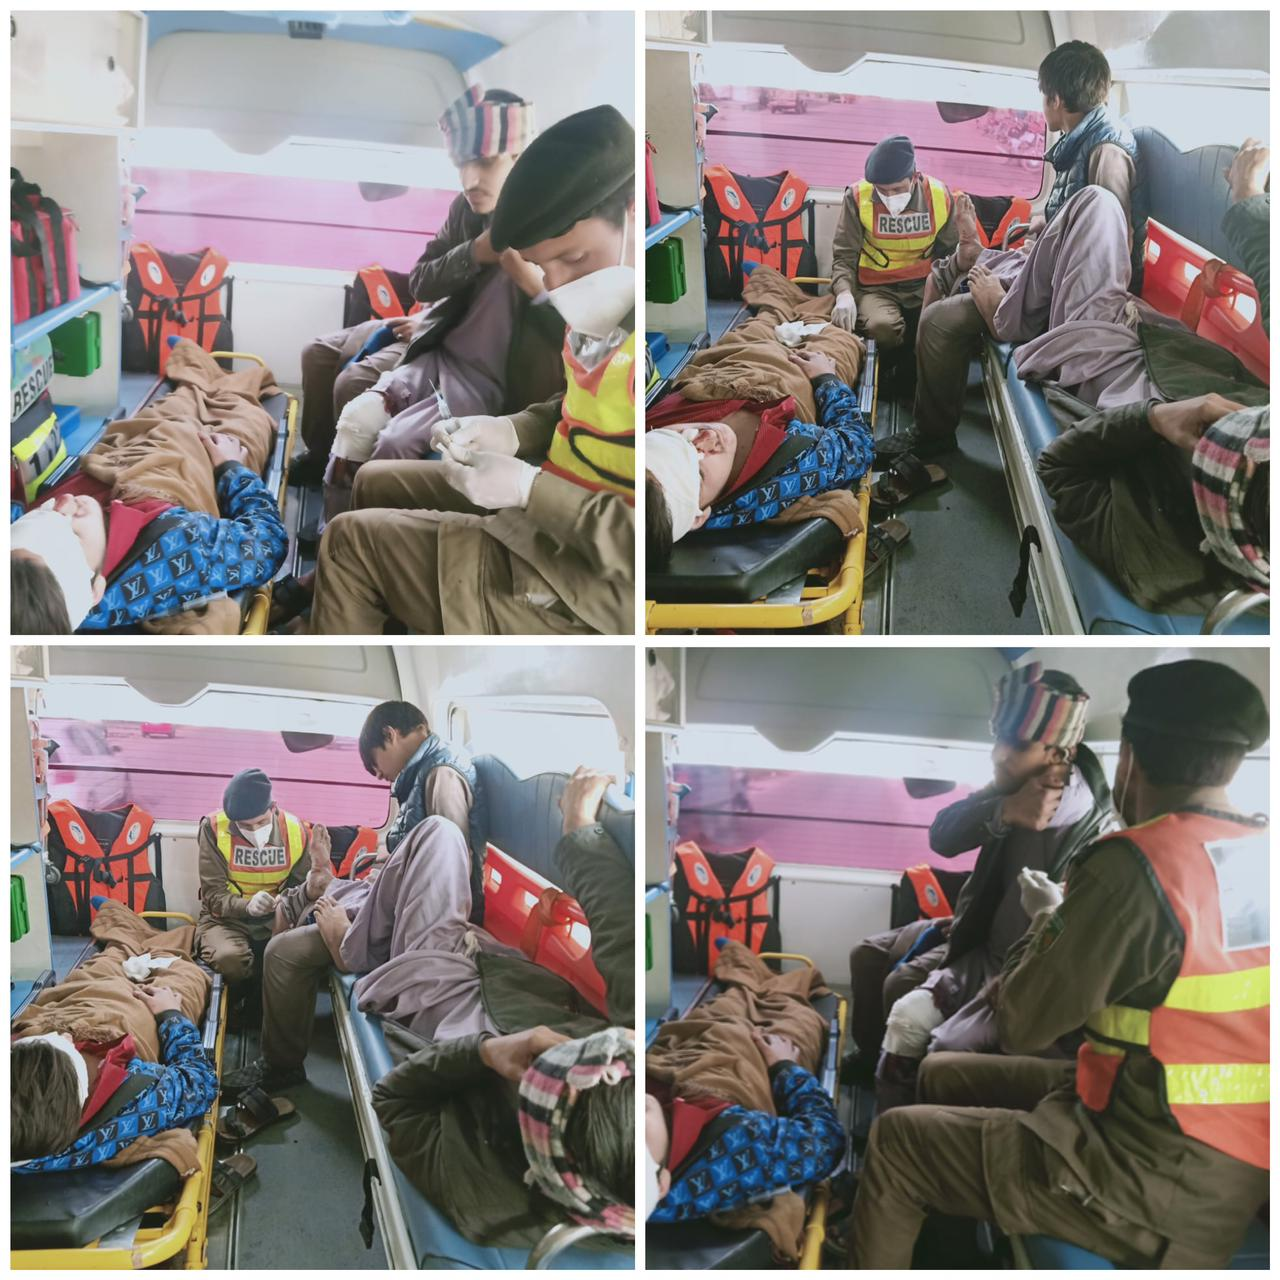 سوات، مختلف حادثات میں 8 افراد زخمی